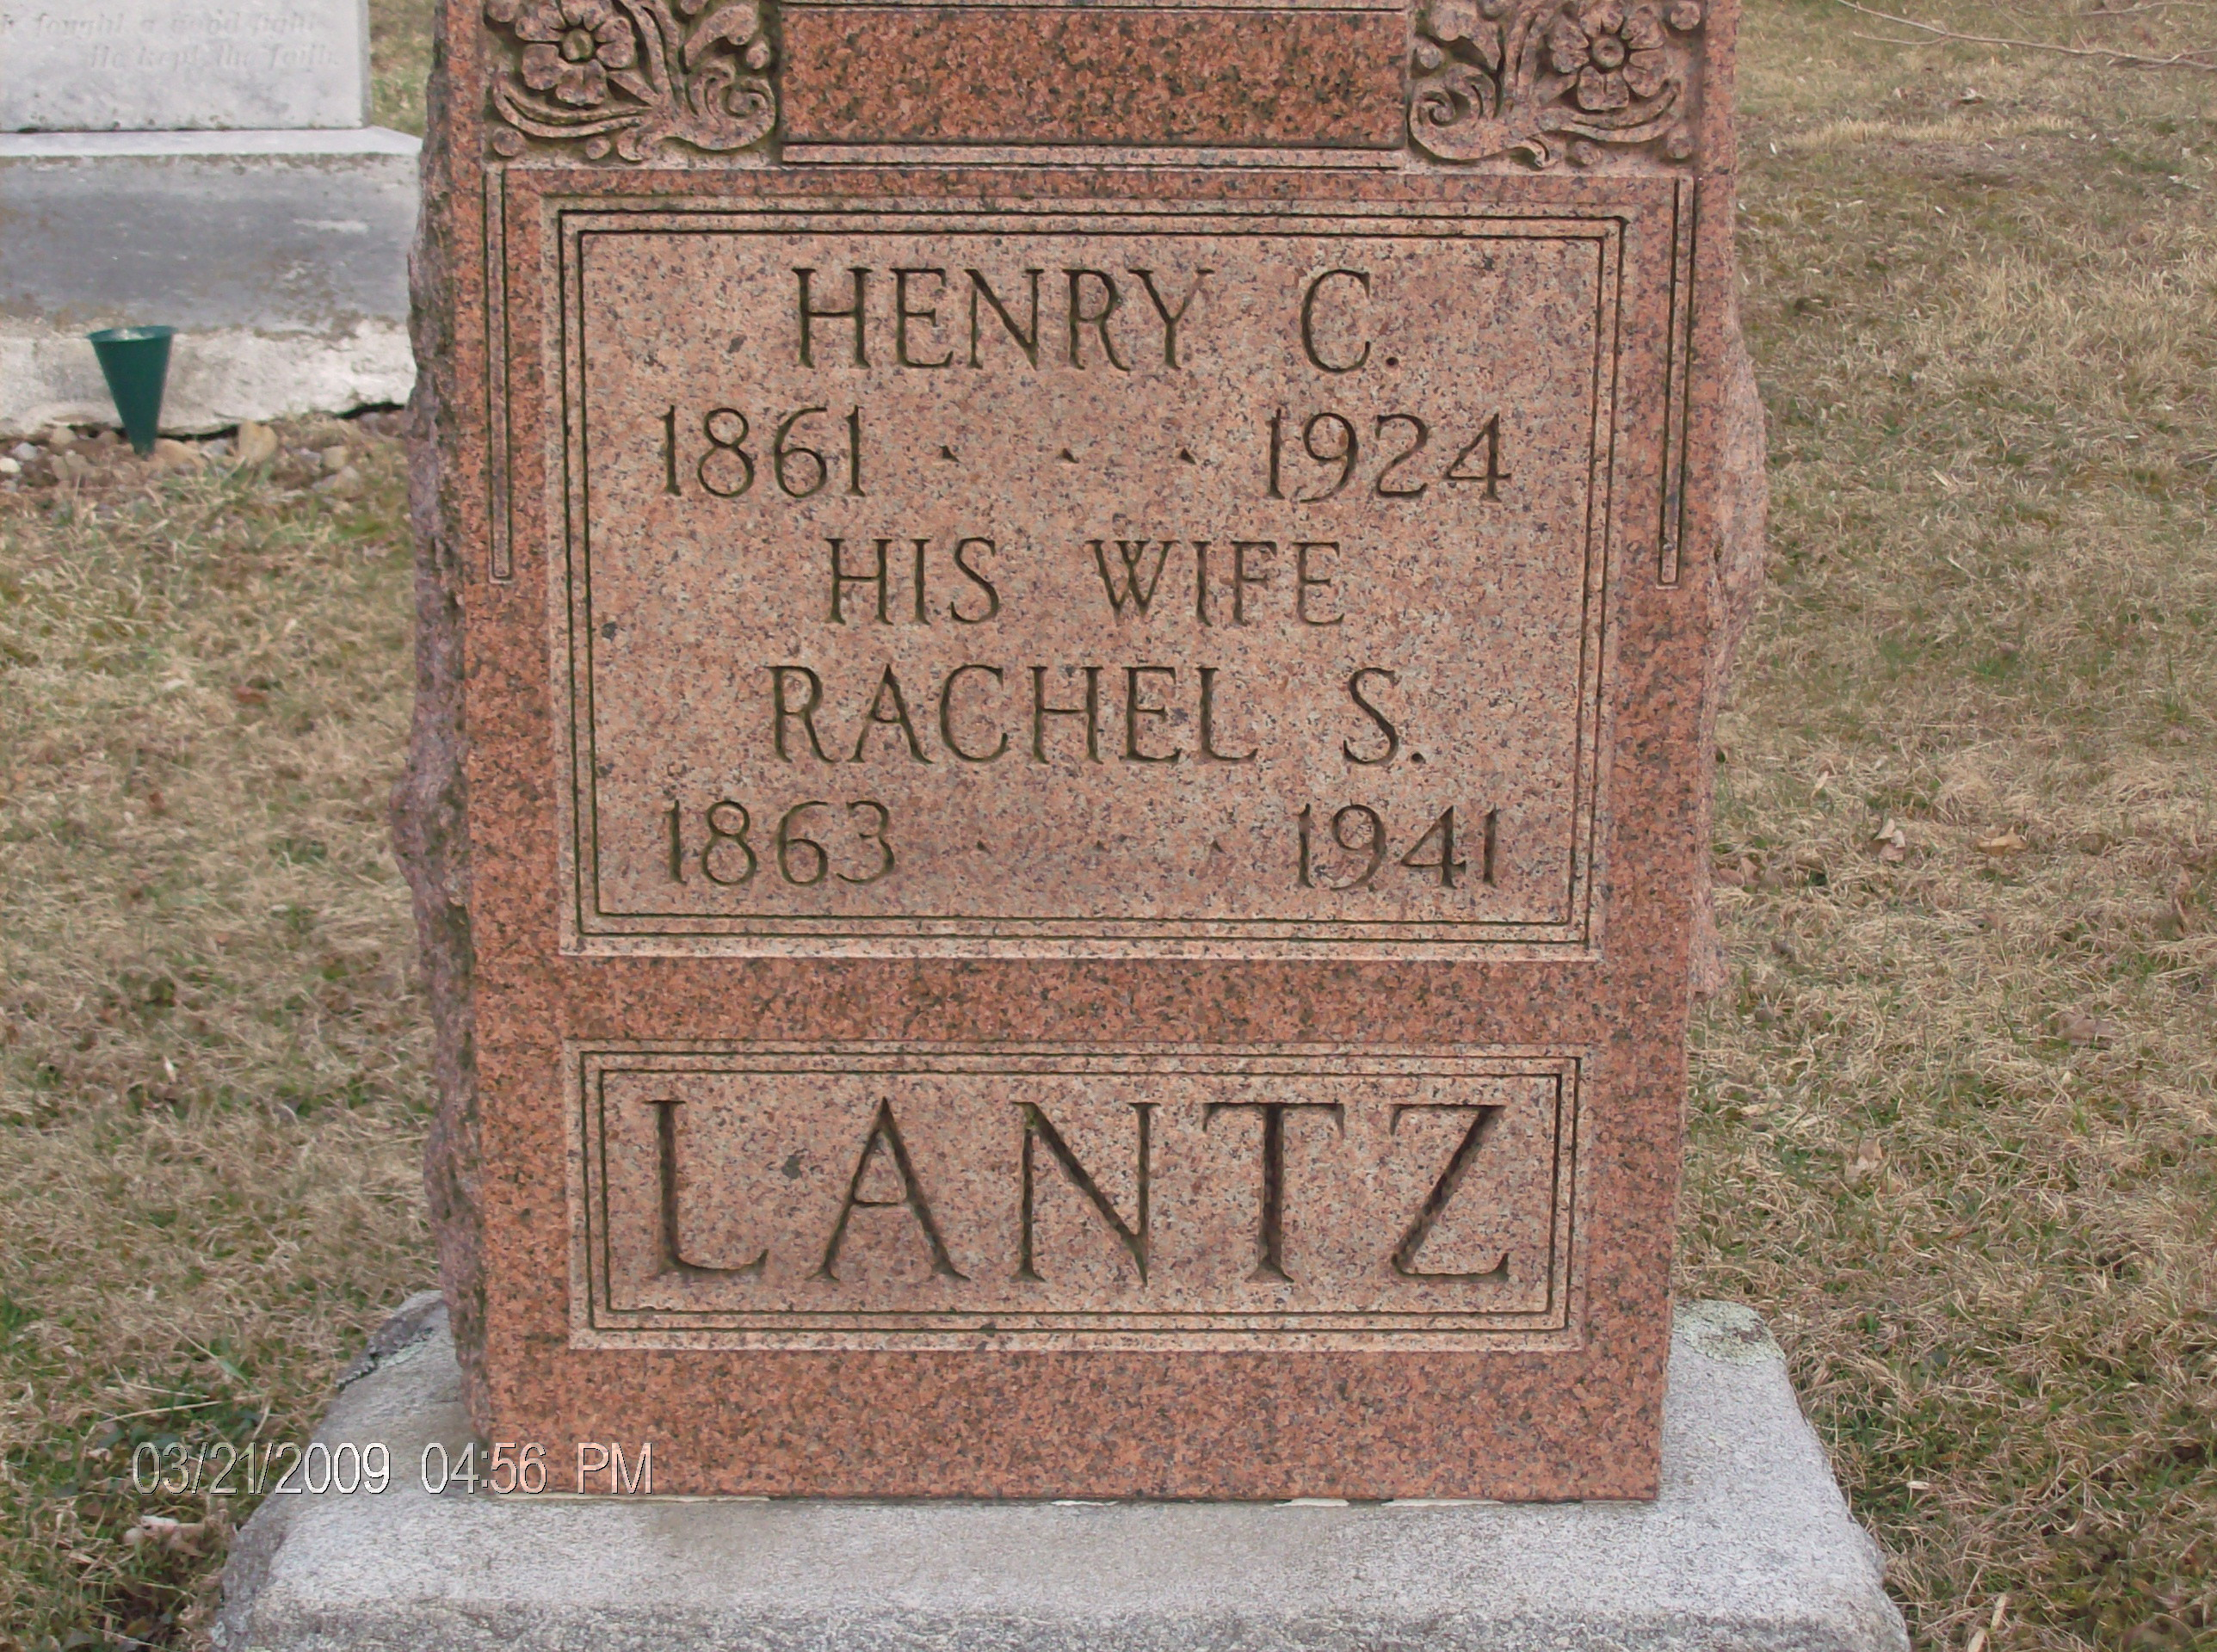 Leonard Lantz